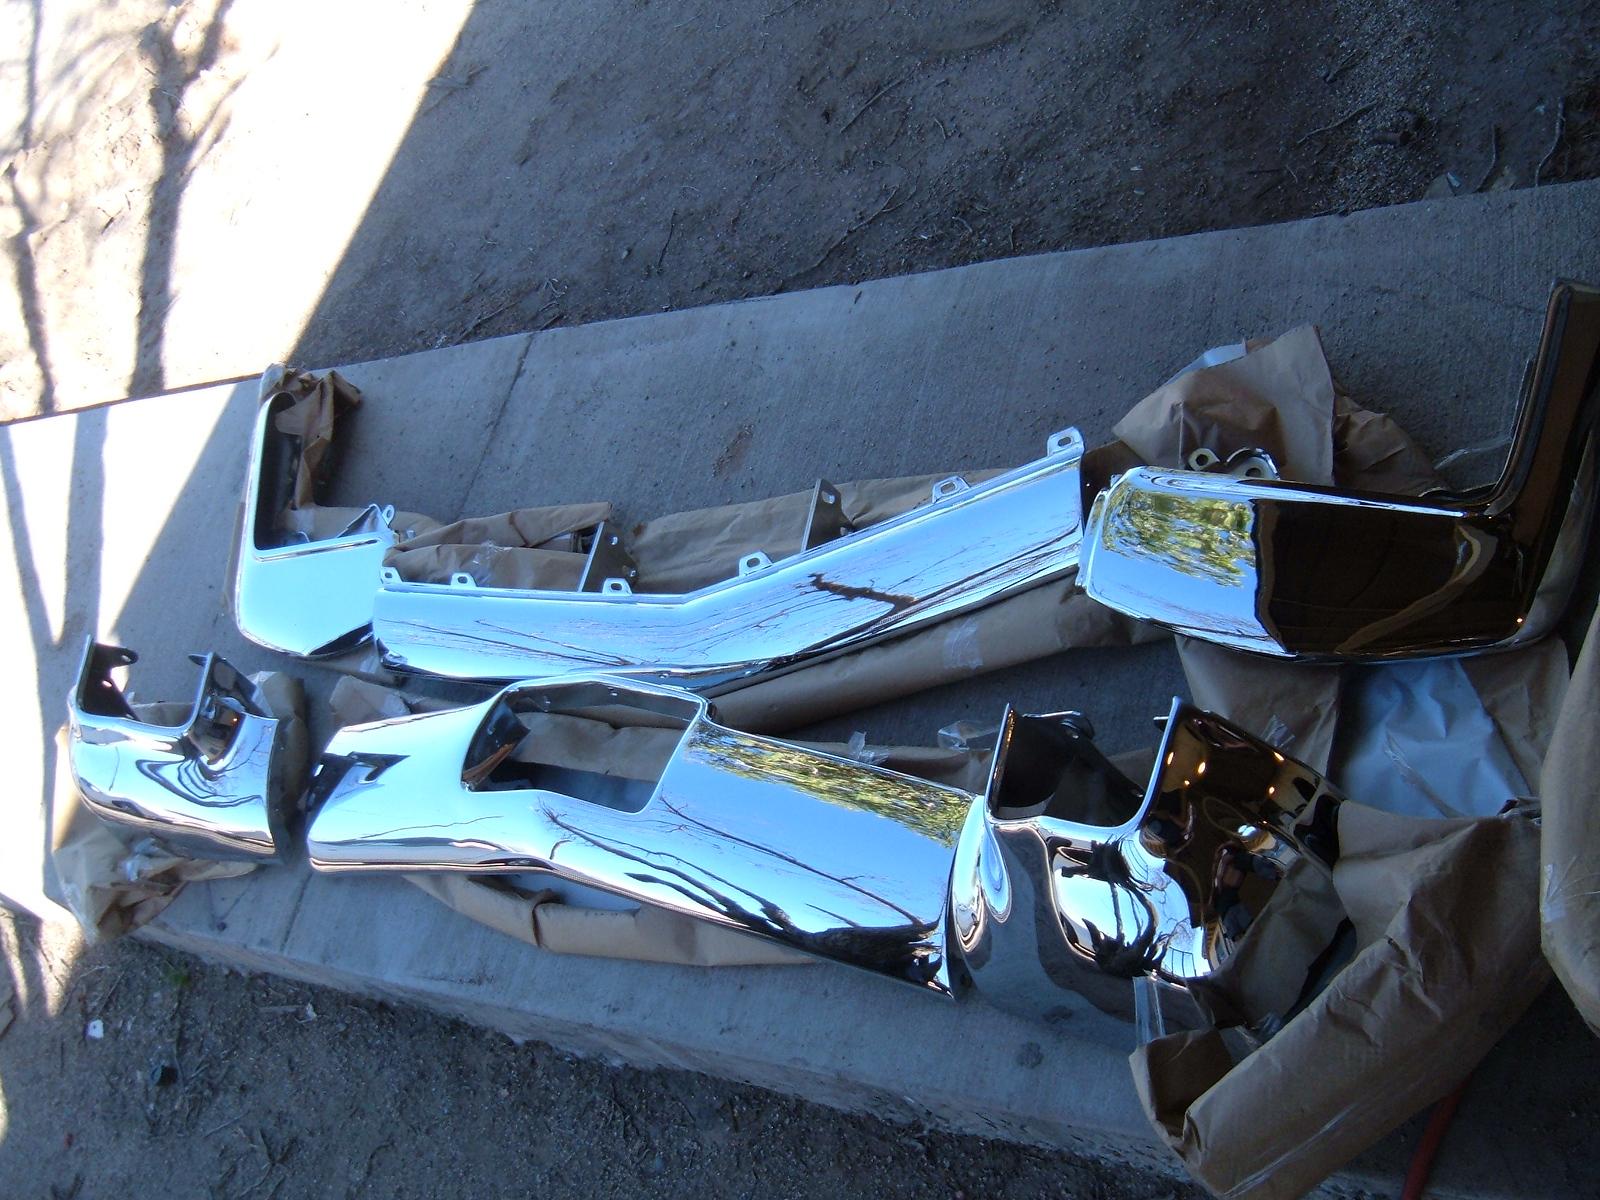 View Product1962 cadillac rechromed front bumper 6 parts (z 62 cad bumper)